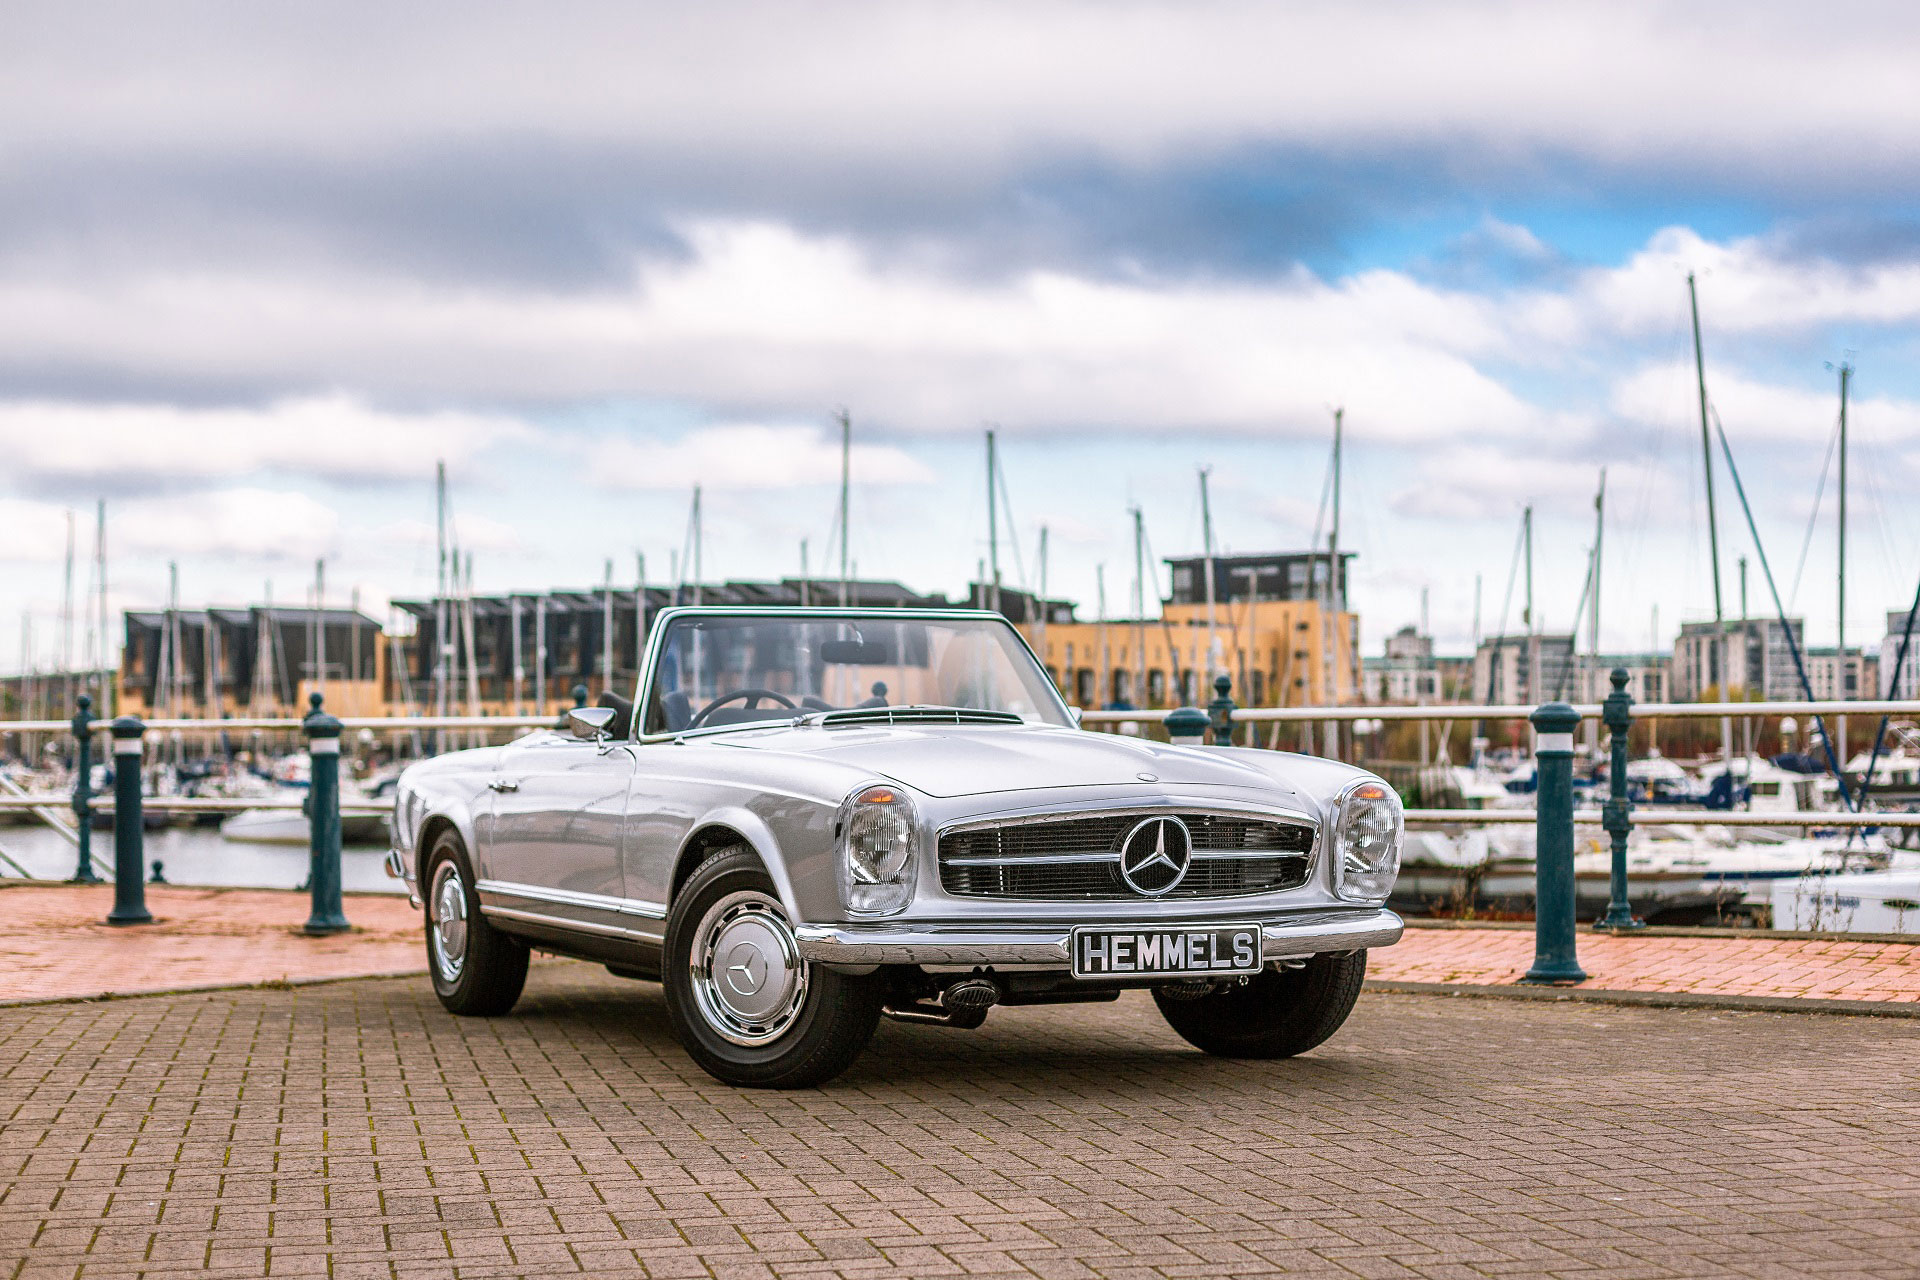 Classic 1971 Mercedes Benz W113 280SL Pagoda  in silver by Cardiff marina